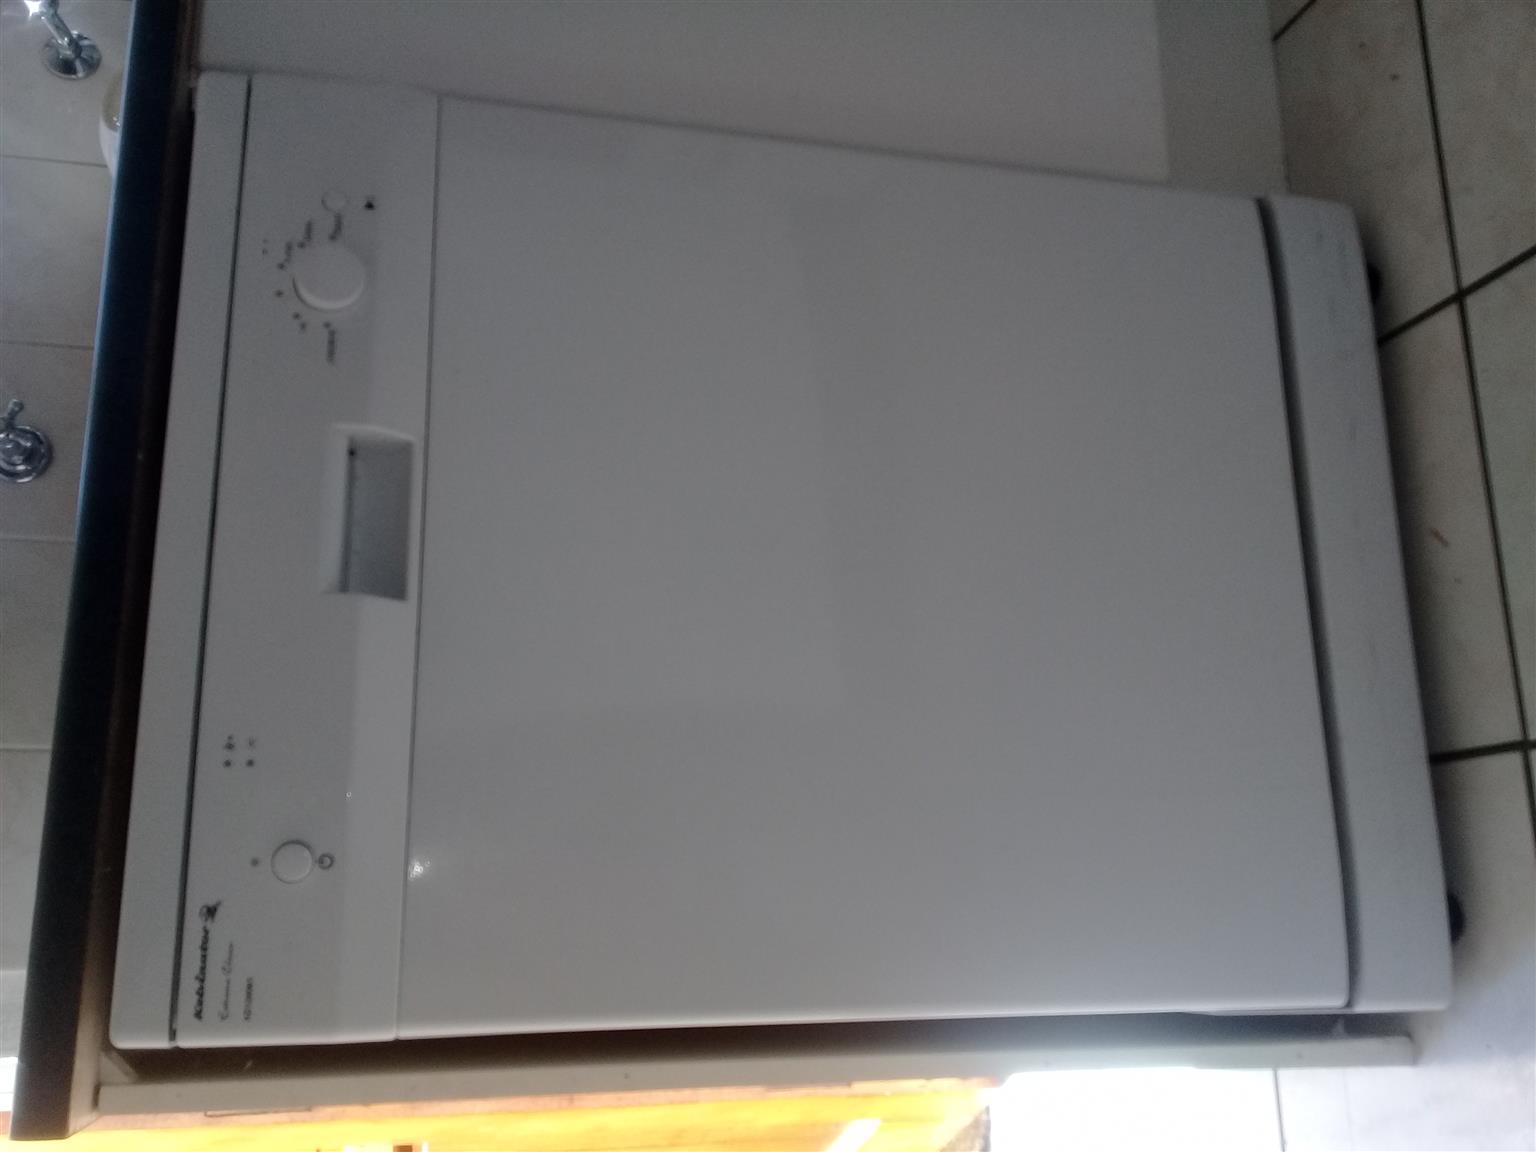 Dishwasher - kelvinator KD12ww1